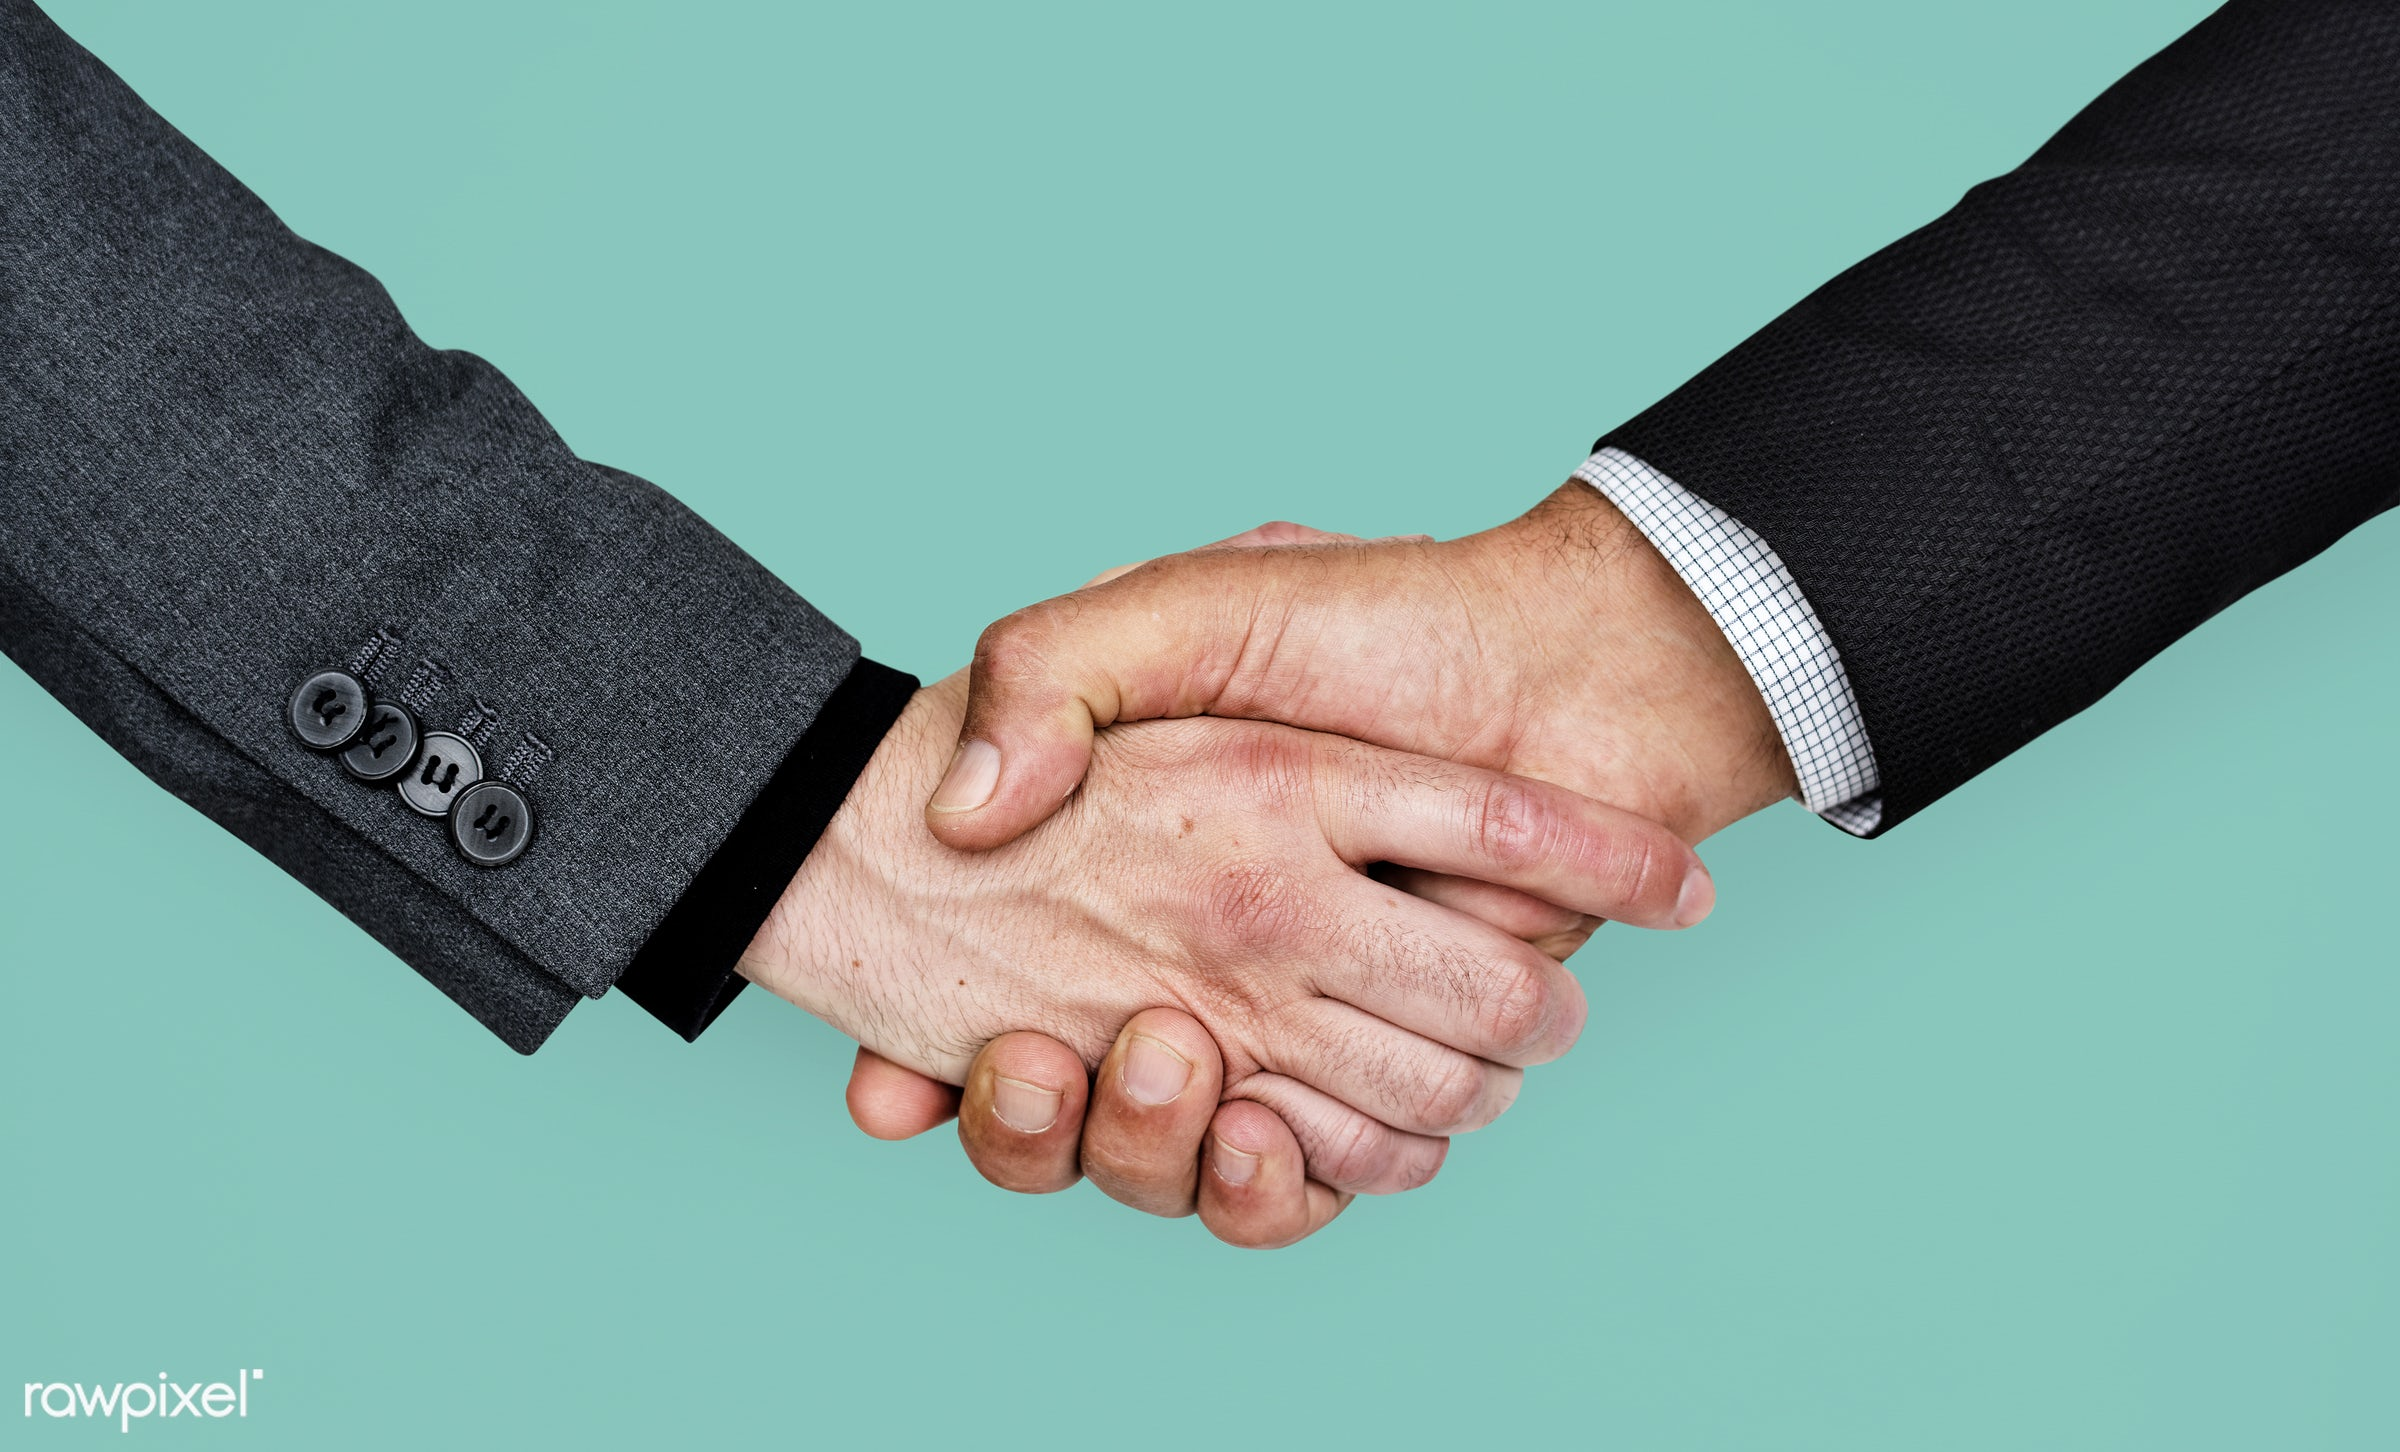 studio, collaboration, bonding, business, corporate business, teamwork, sharing, friends, hands, friendship, cooperation,...